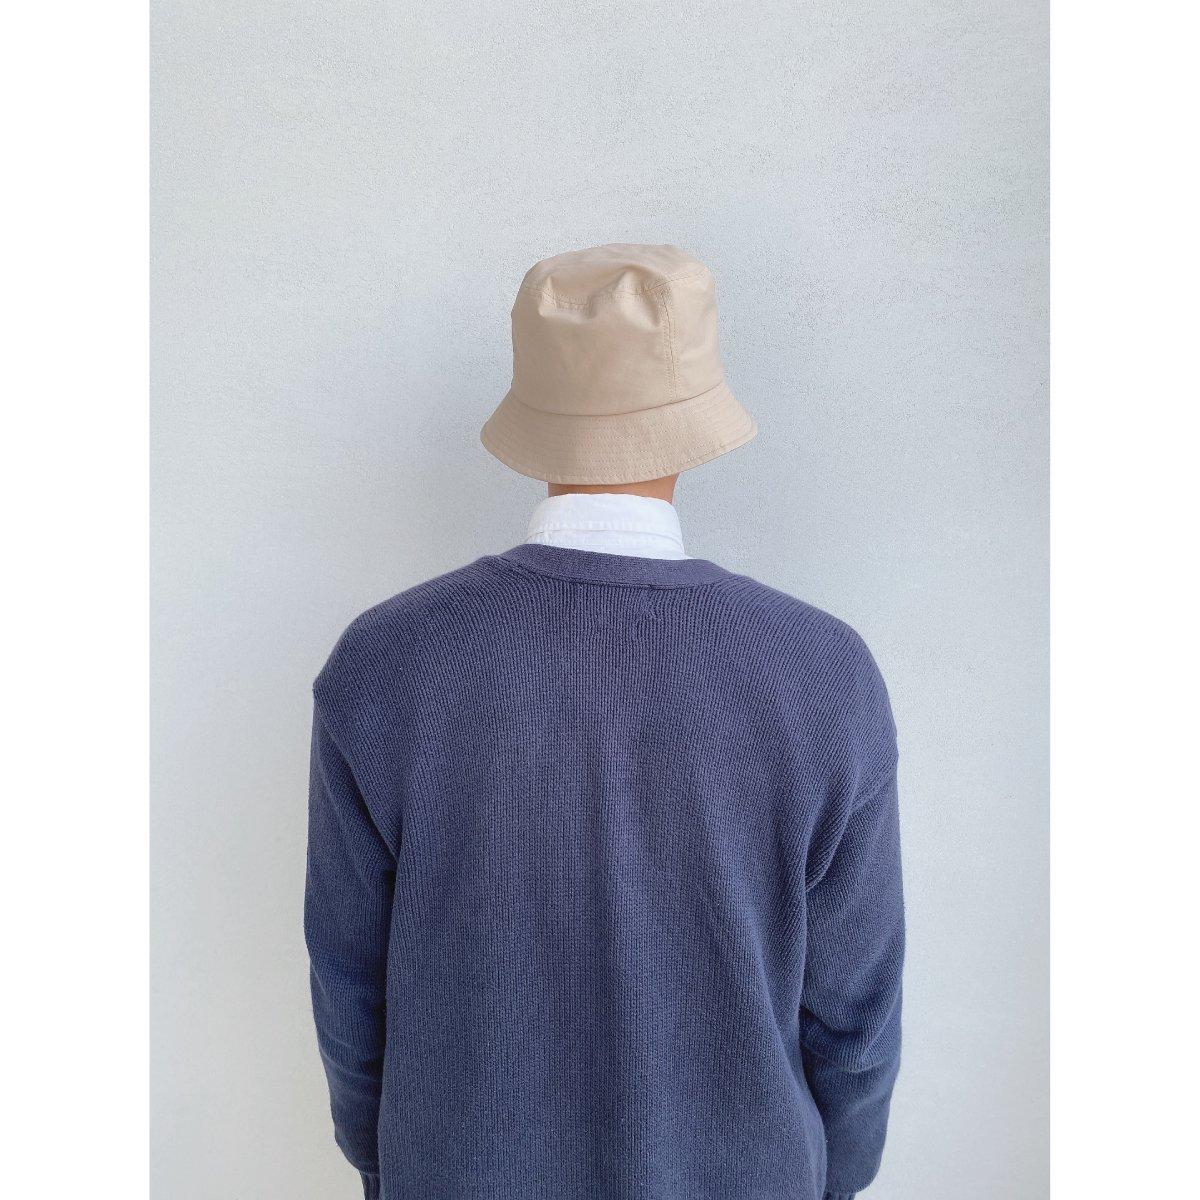 Genius BK Hat 詳細画像21